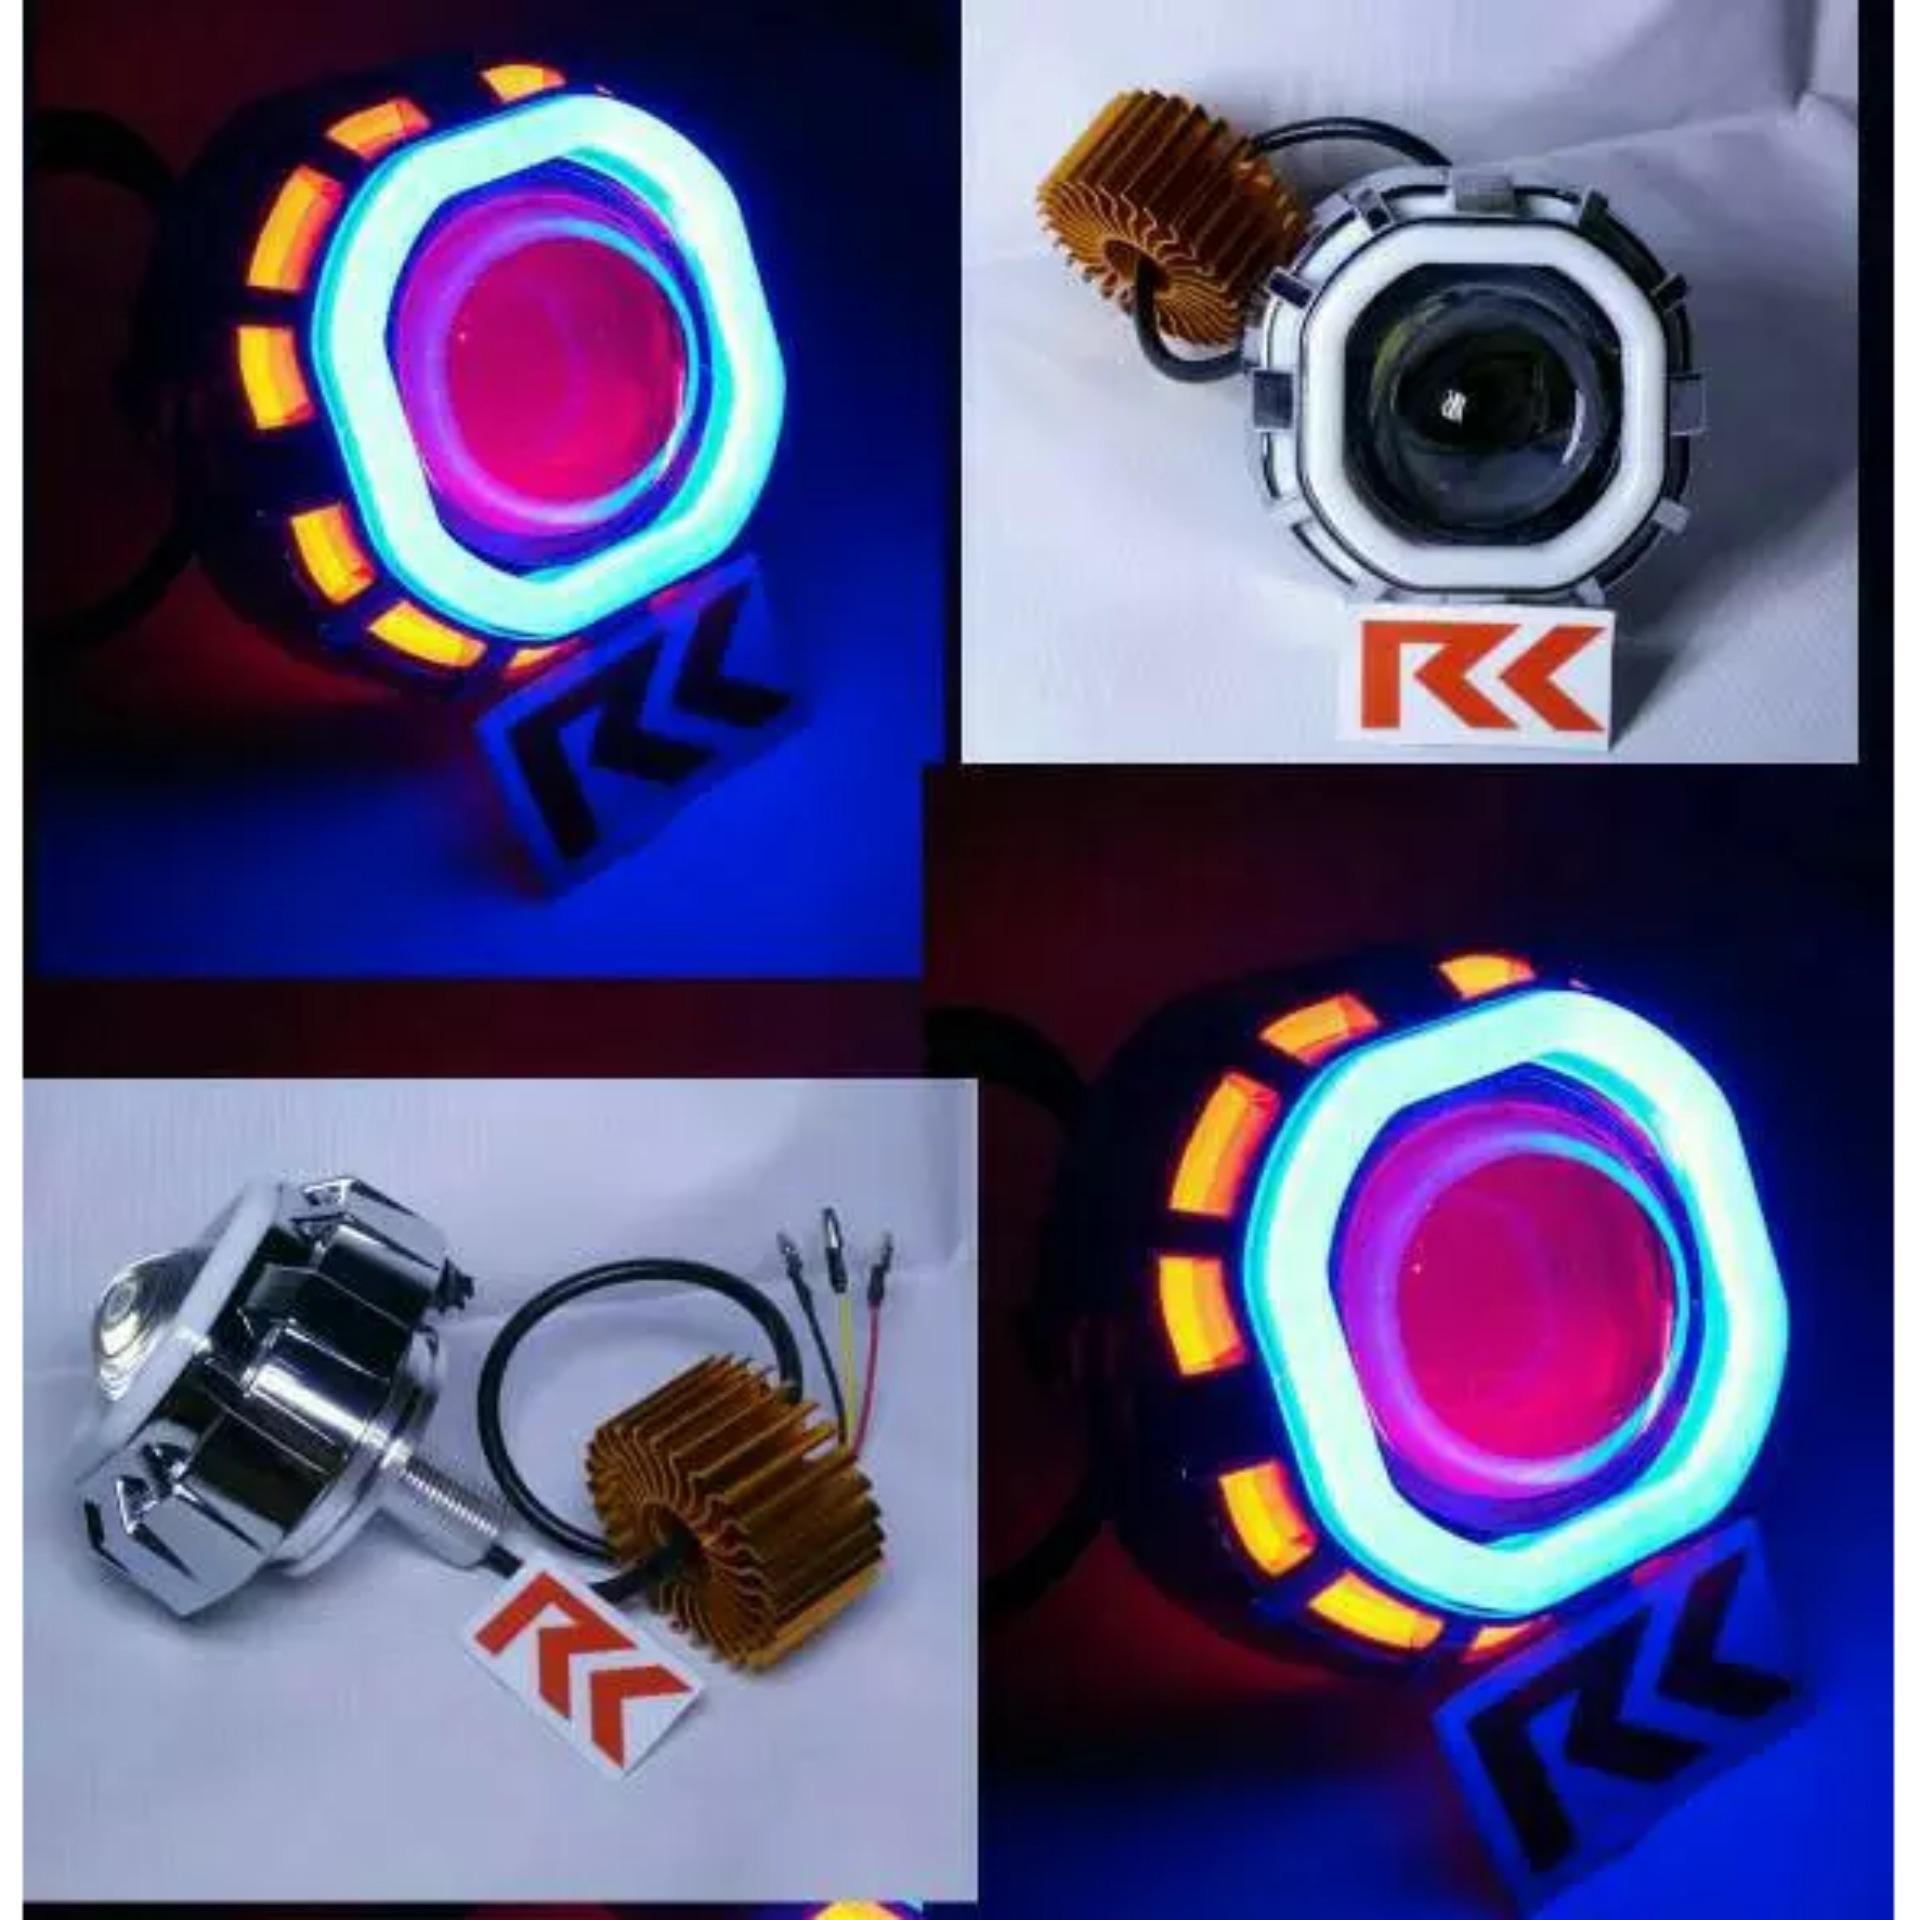 Otomotif Store Lampu Led Projie Angel Eyes Devil Bulat Update Tembak U26r Mini 3 Inch Running Campur Projector U8 Double Ae De Dan